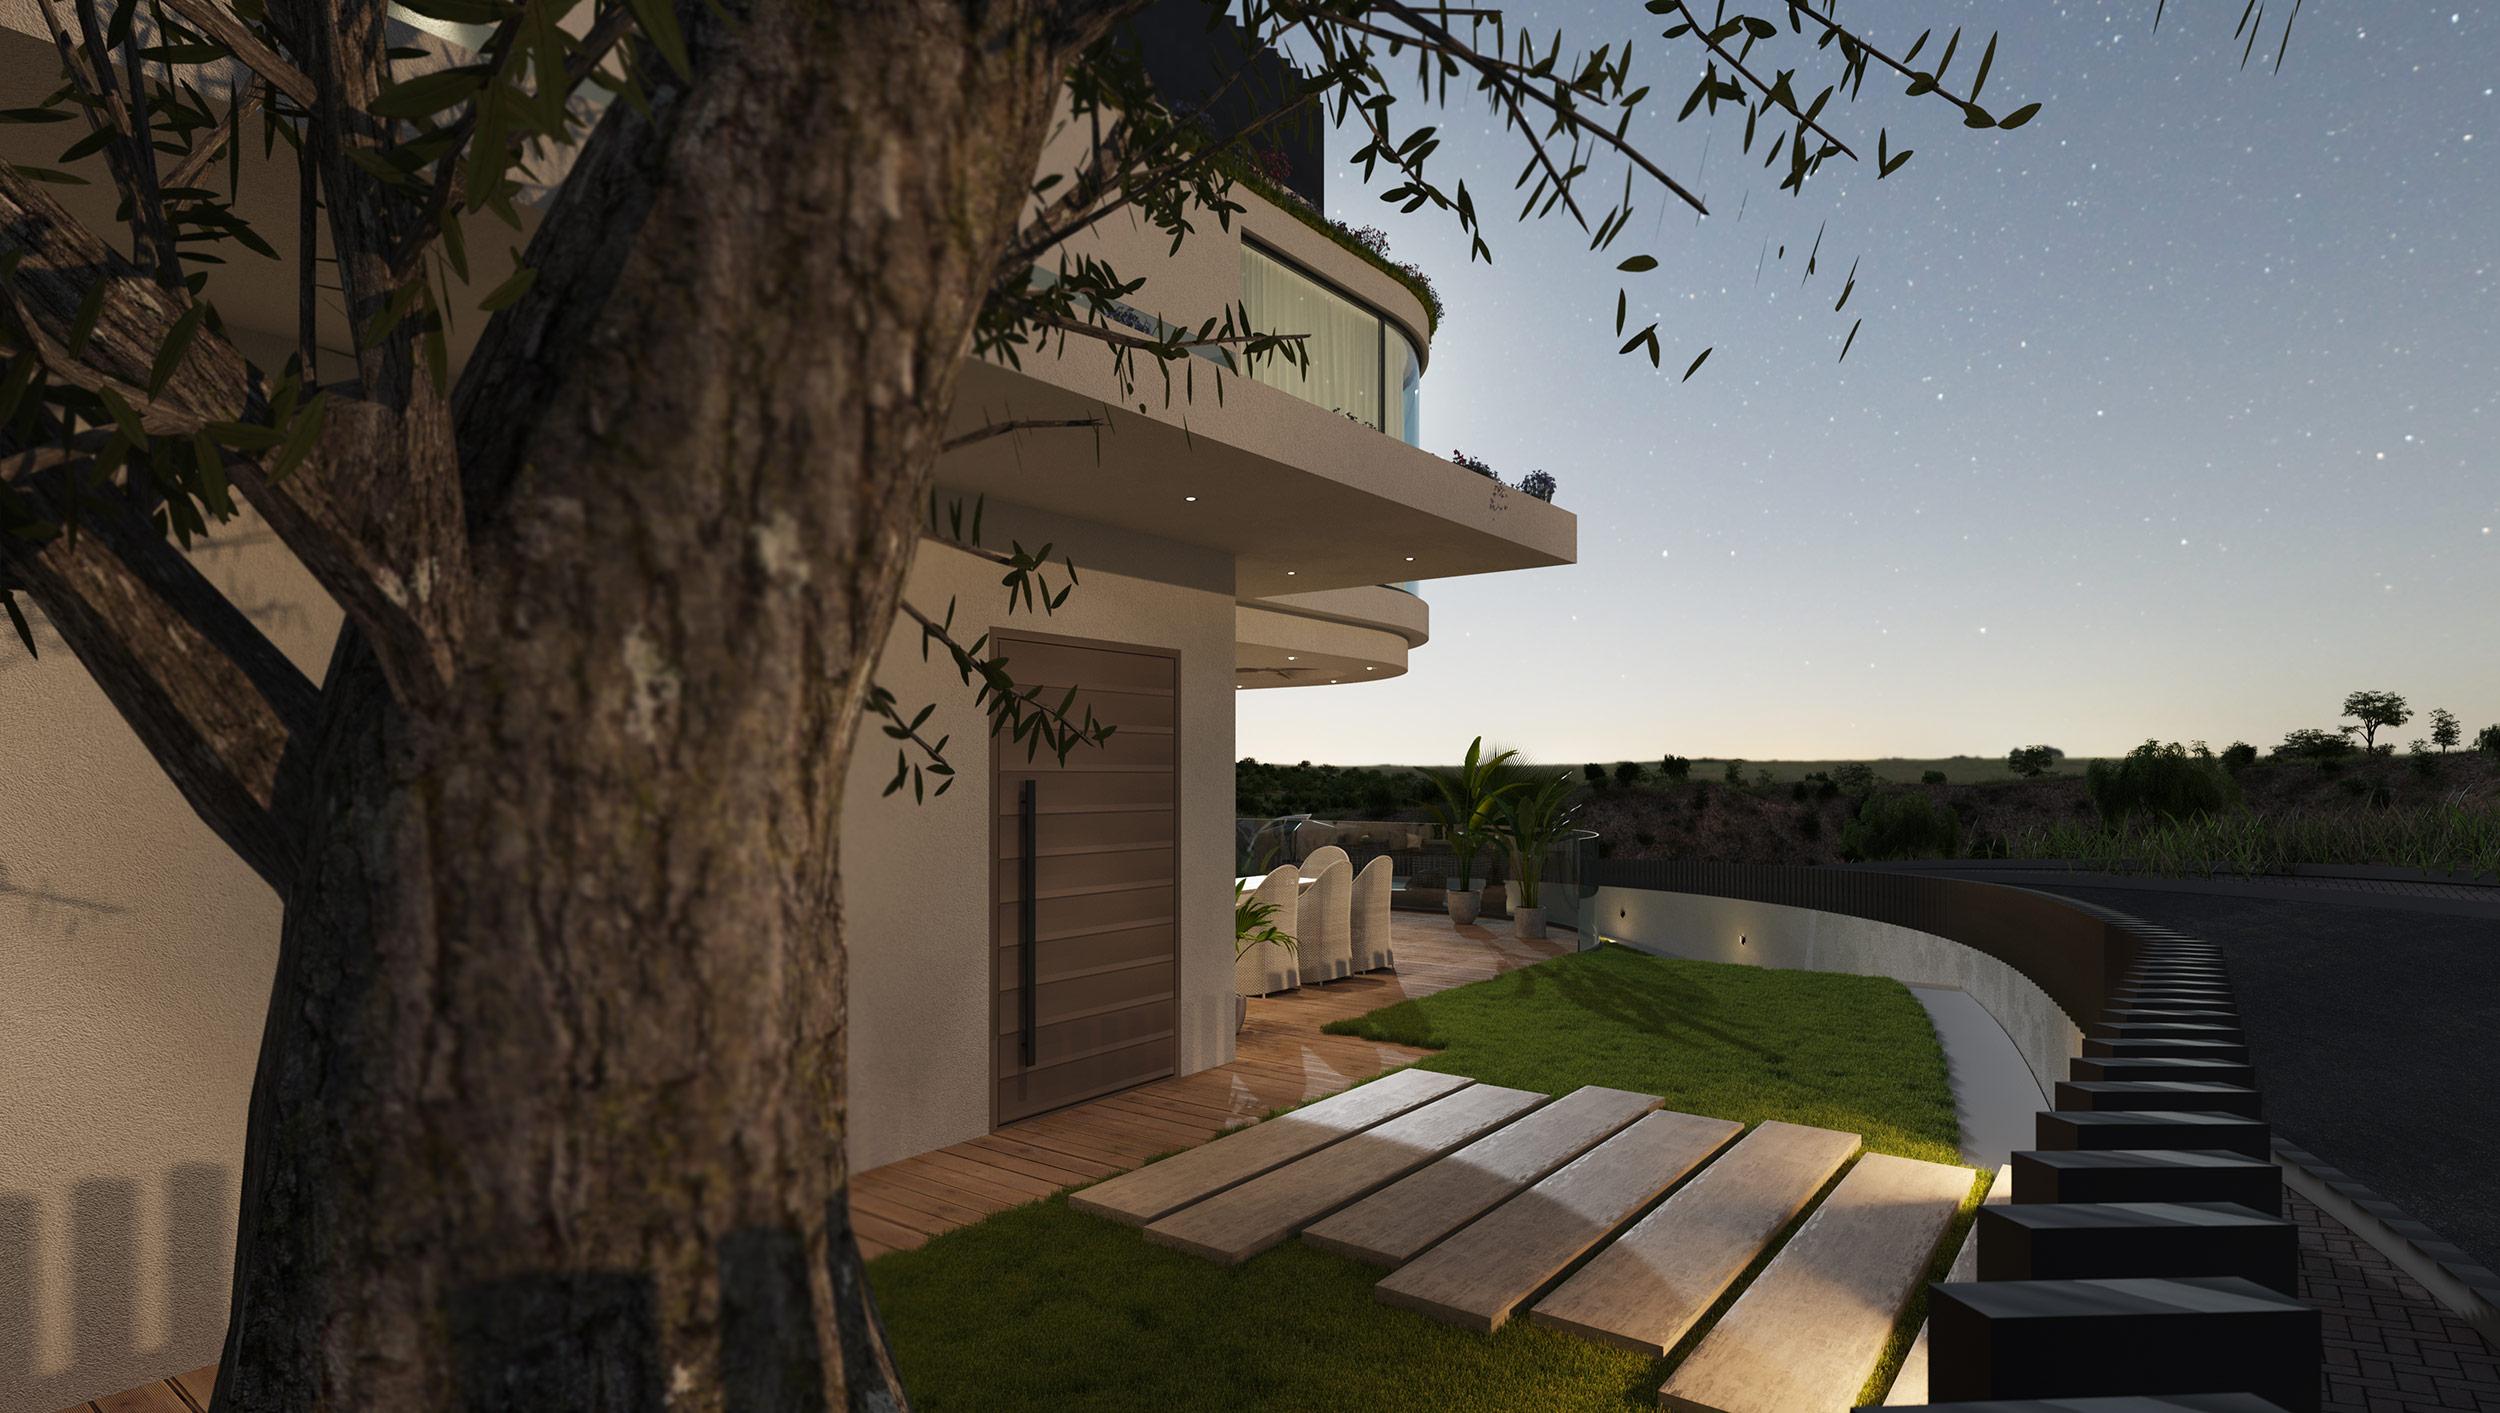 https://www.atelierzoz.com/wp-content/uploads/2020/12/atelierzoz-meadowview-villa-8.jpg